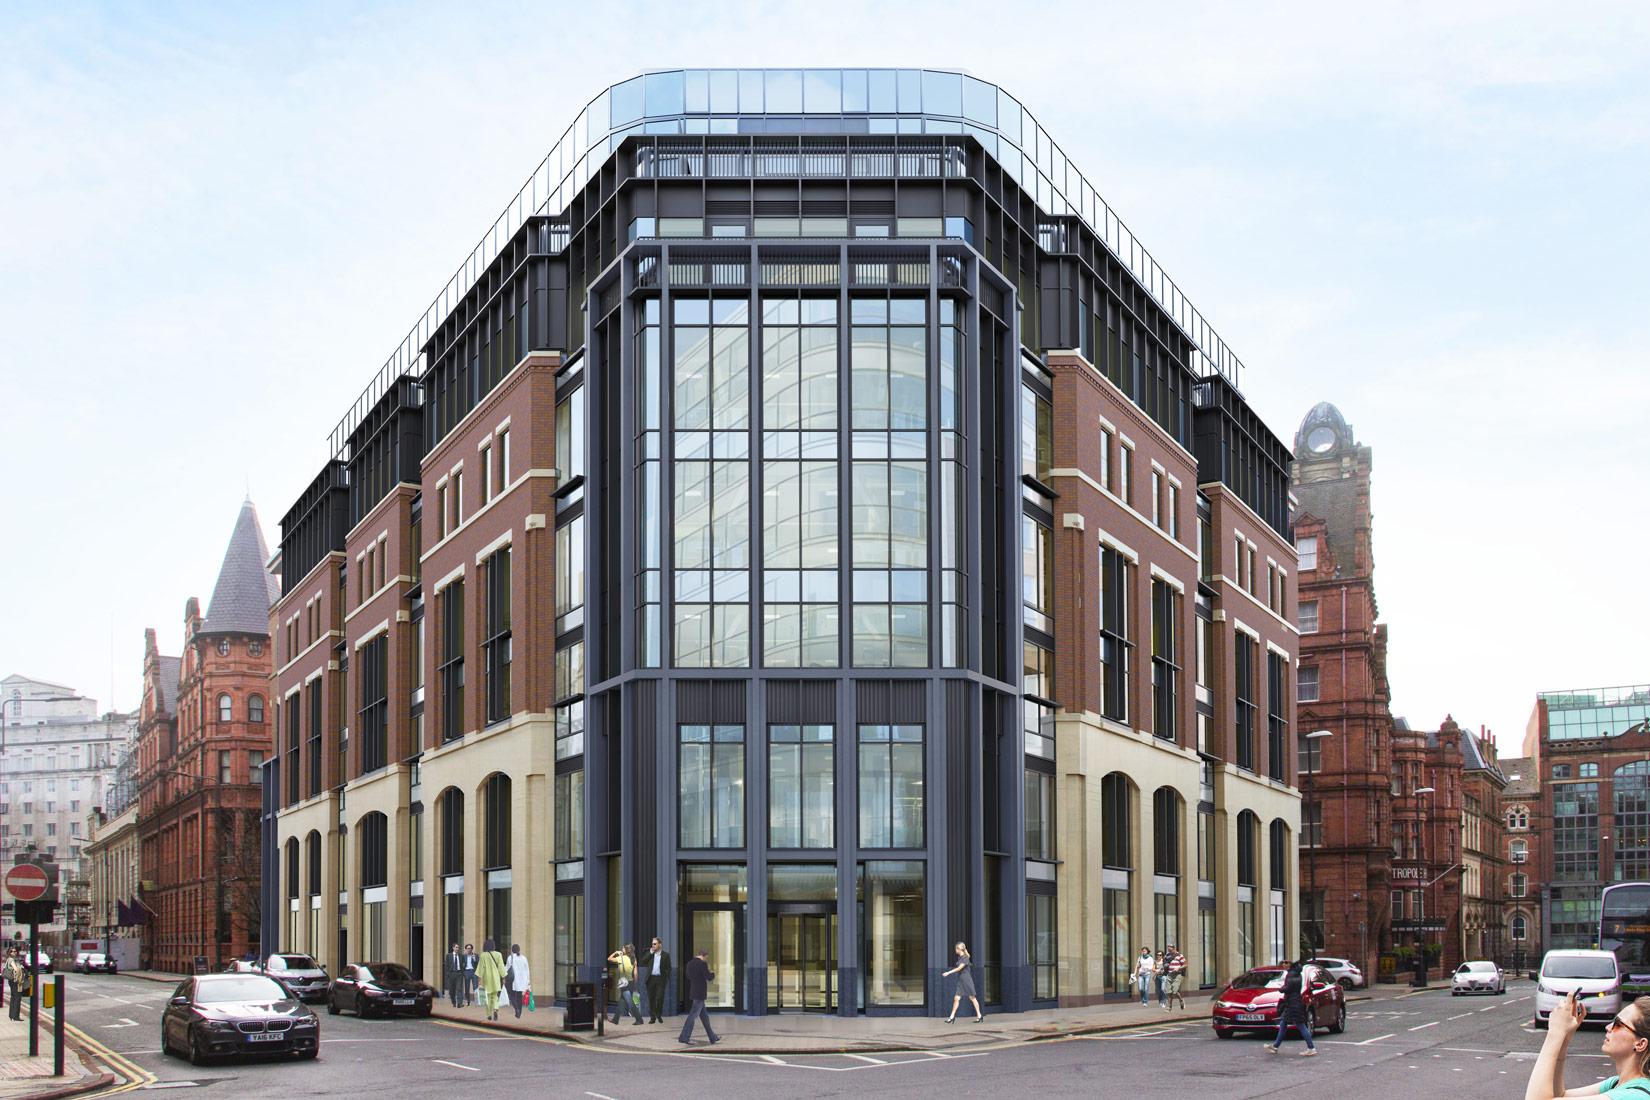 12 King Street, Leeds, 3D visual of exterior